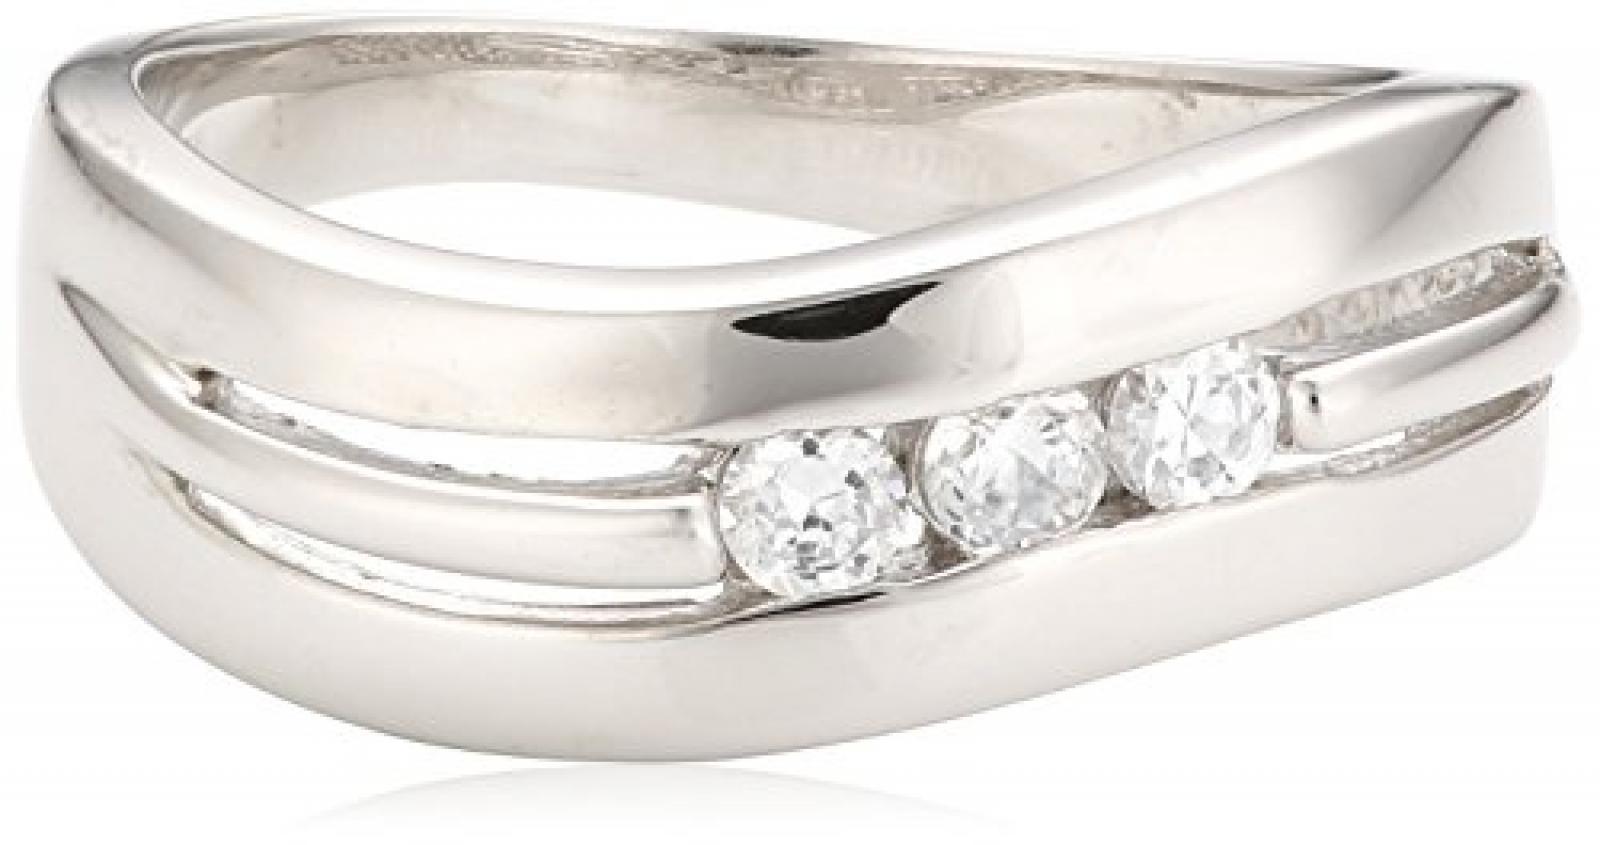 Celesta Damen-Ring 925 Sterlingsilber Zirkonia weiß 360270921